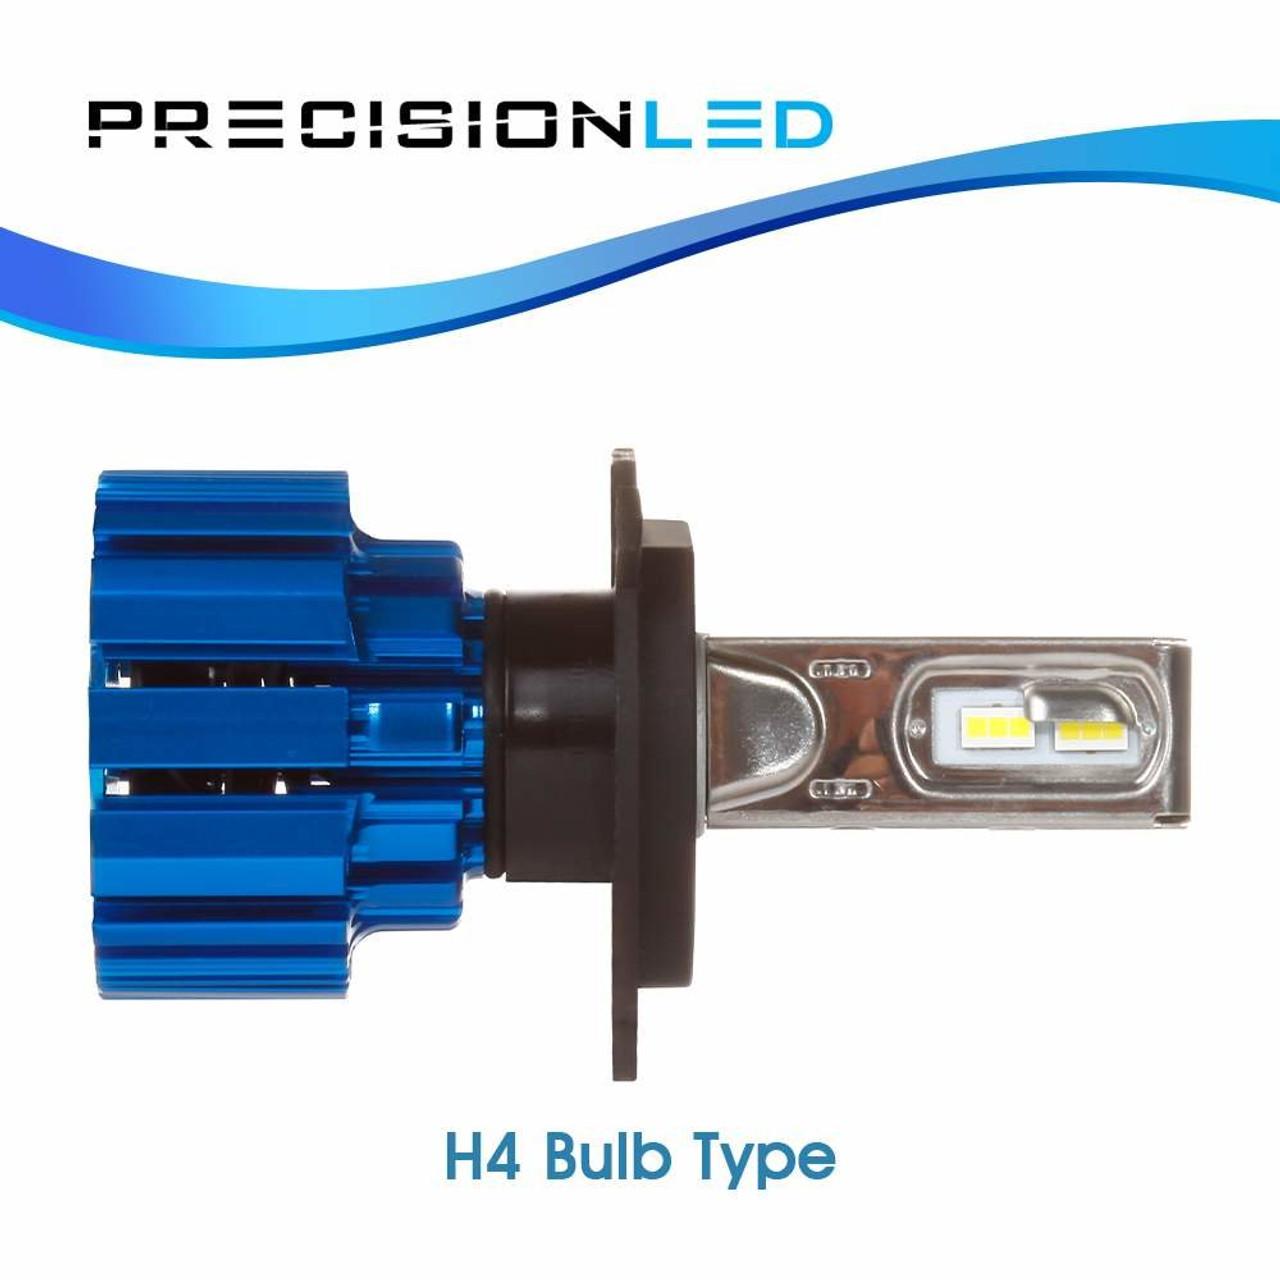 Hyundai Accent Hatch Premium LED Headlight Package 2015, 2014, 2013, 2012 | Hyundai Accent 2012 Headlight Bulb |  | PrecisionLED